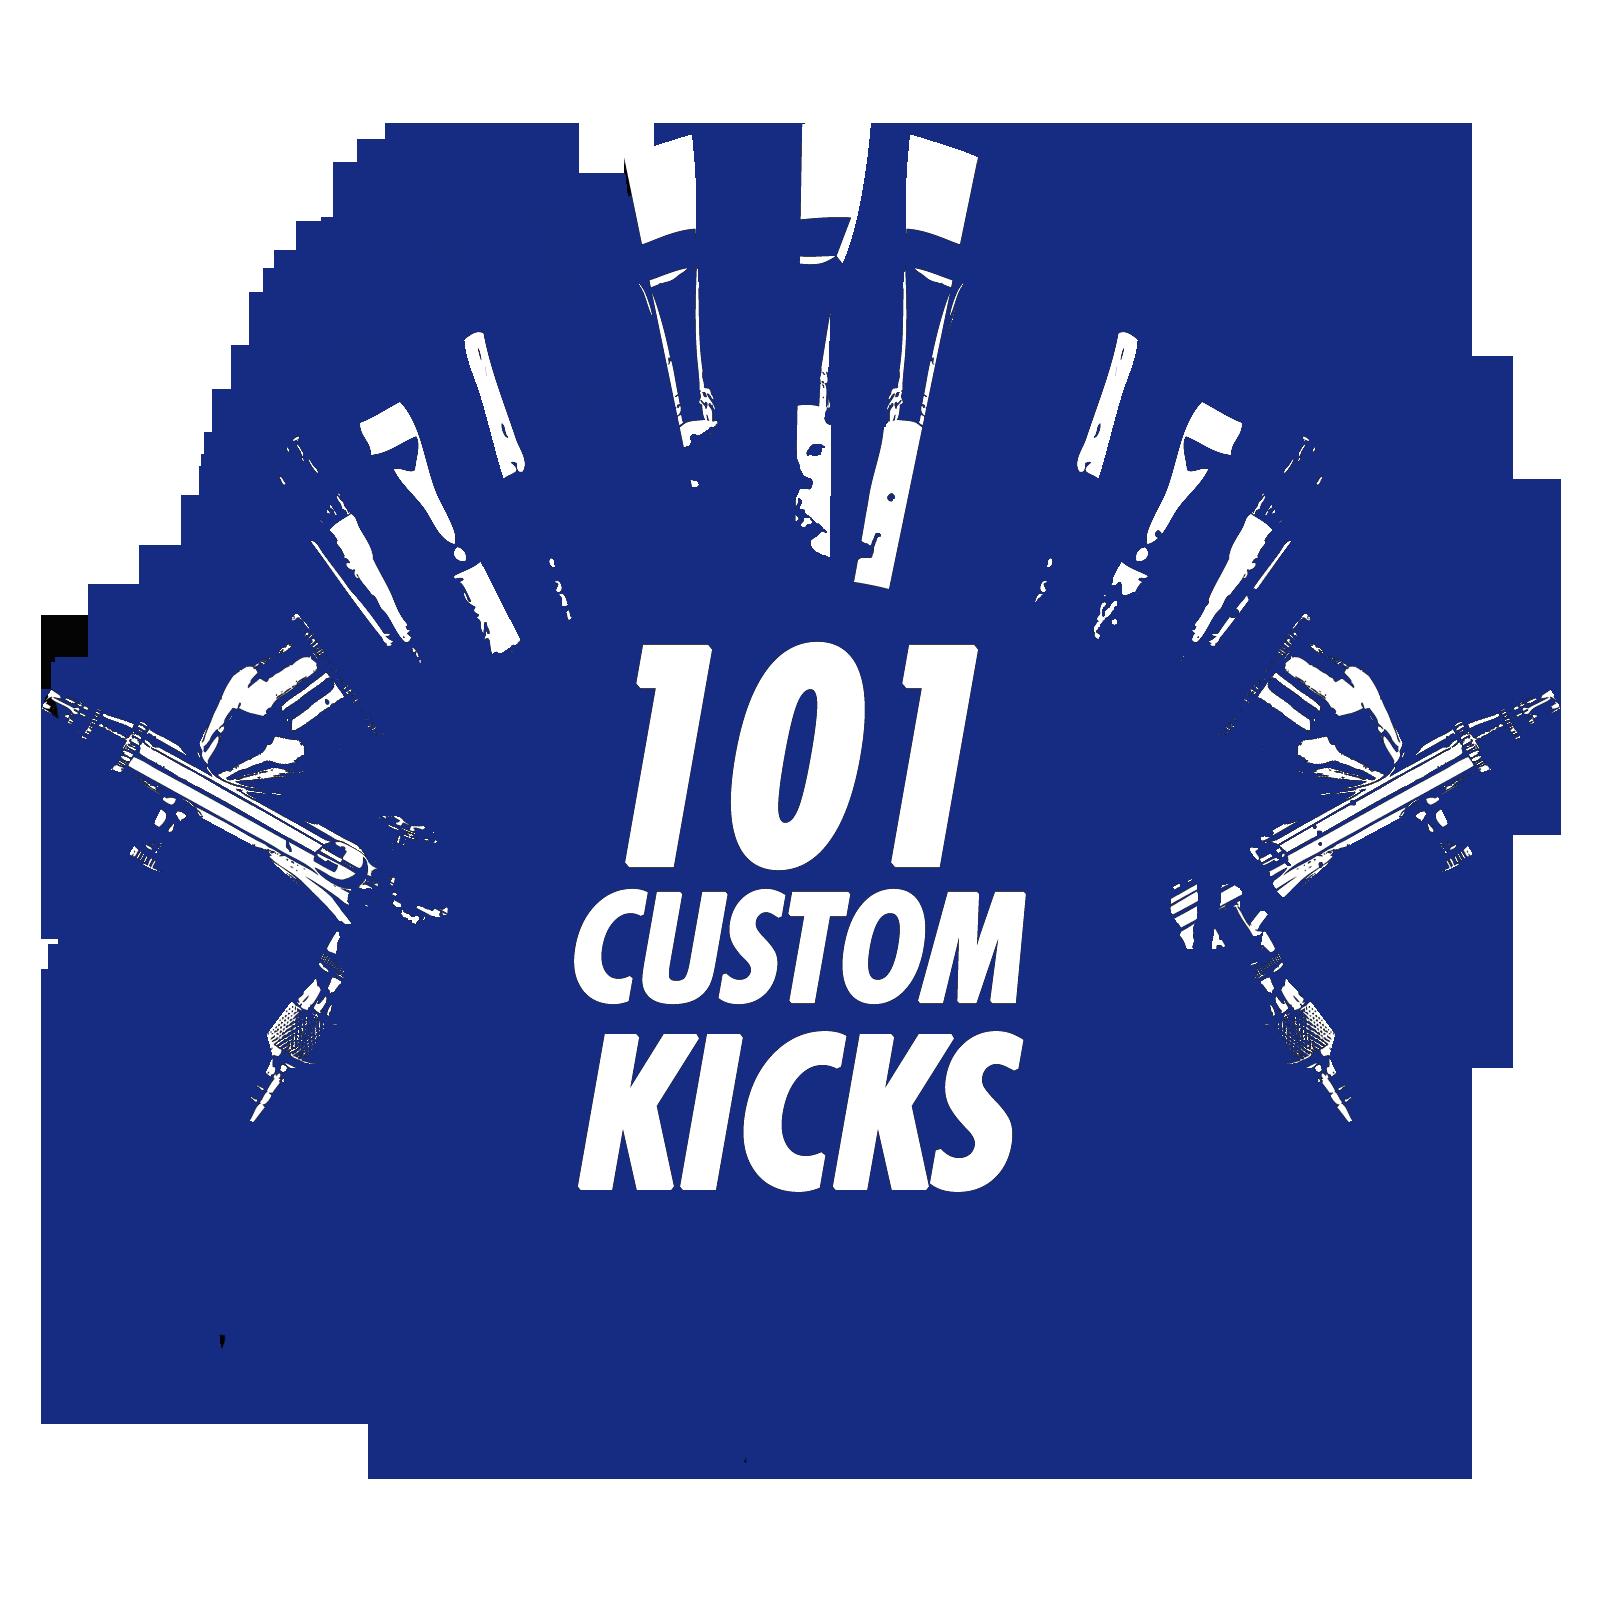 101 custom kicks complete Blue.png